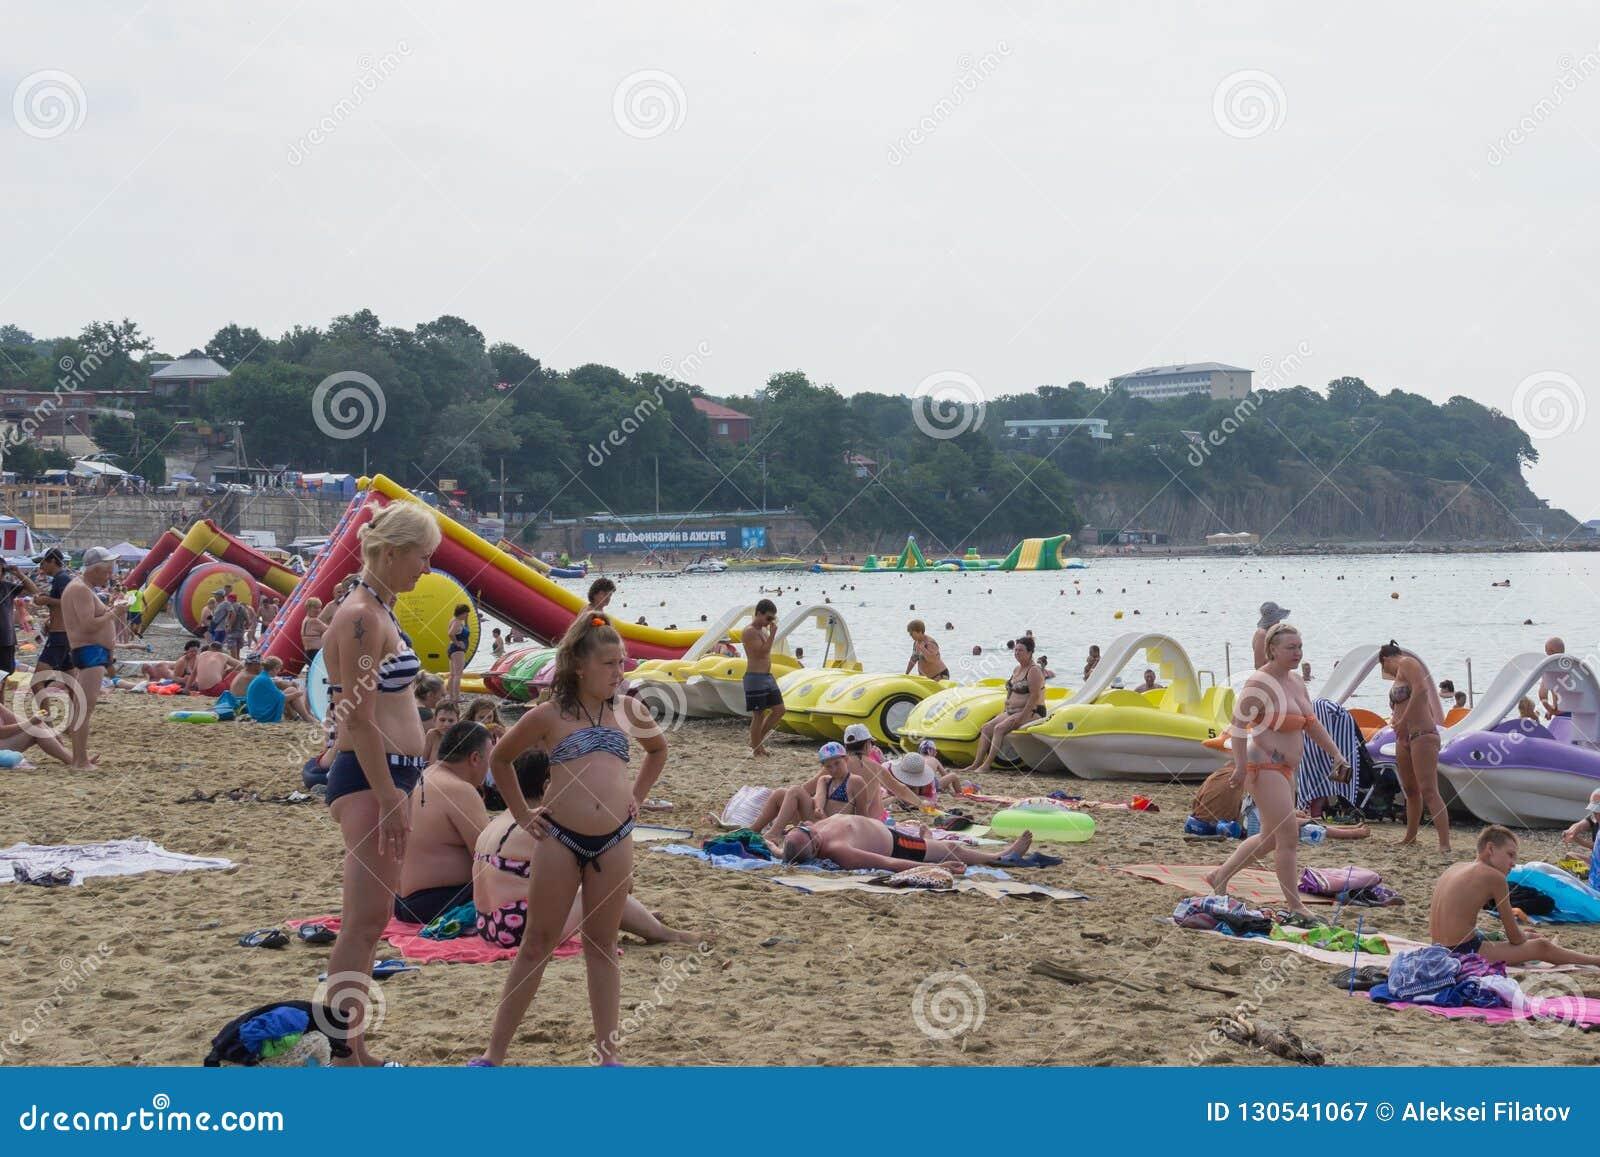 Village Dzhubga Beach Krasnodar Krai Russia 15 June 2018 Editorial Photography Image Of Summer Blue 130541067